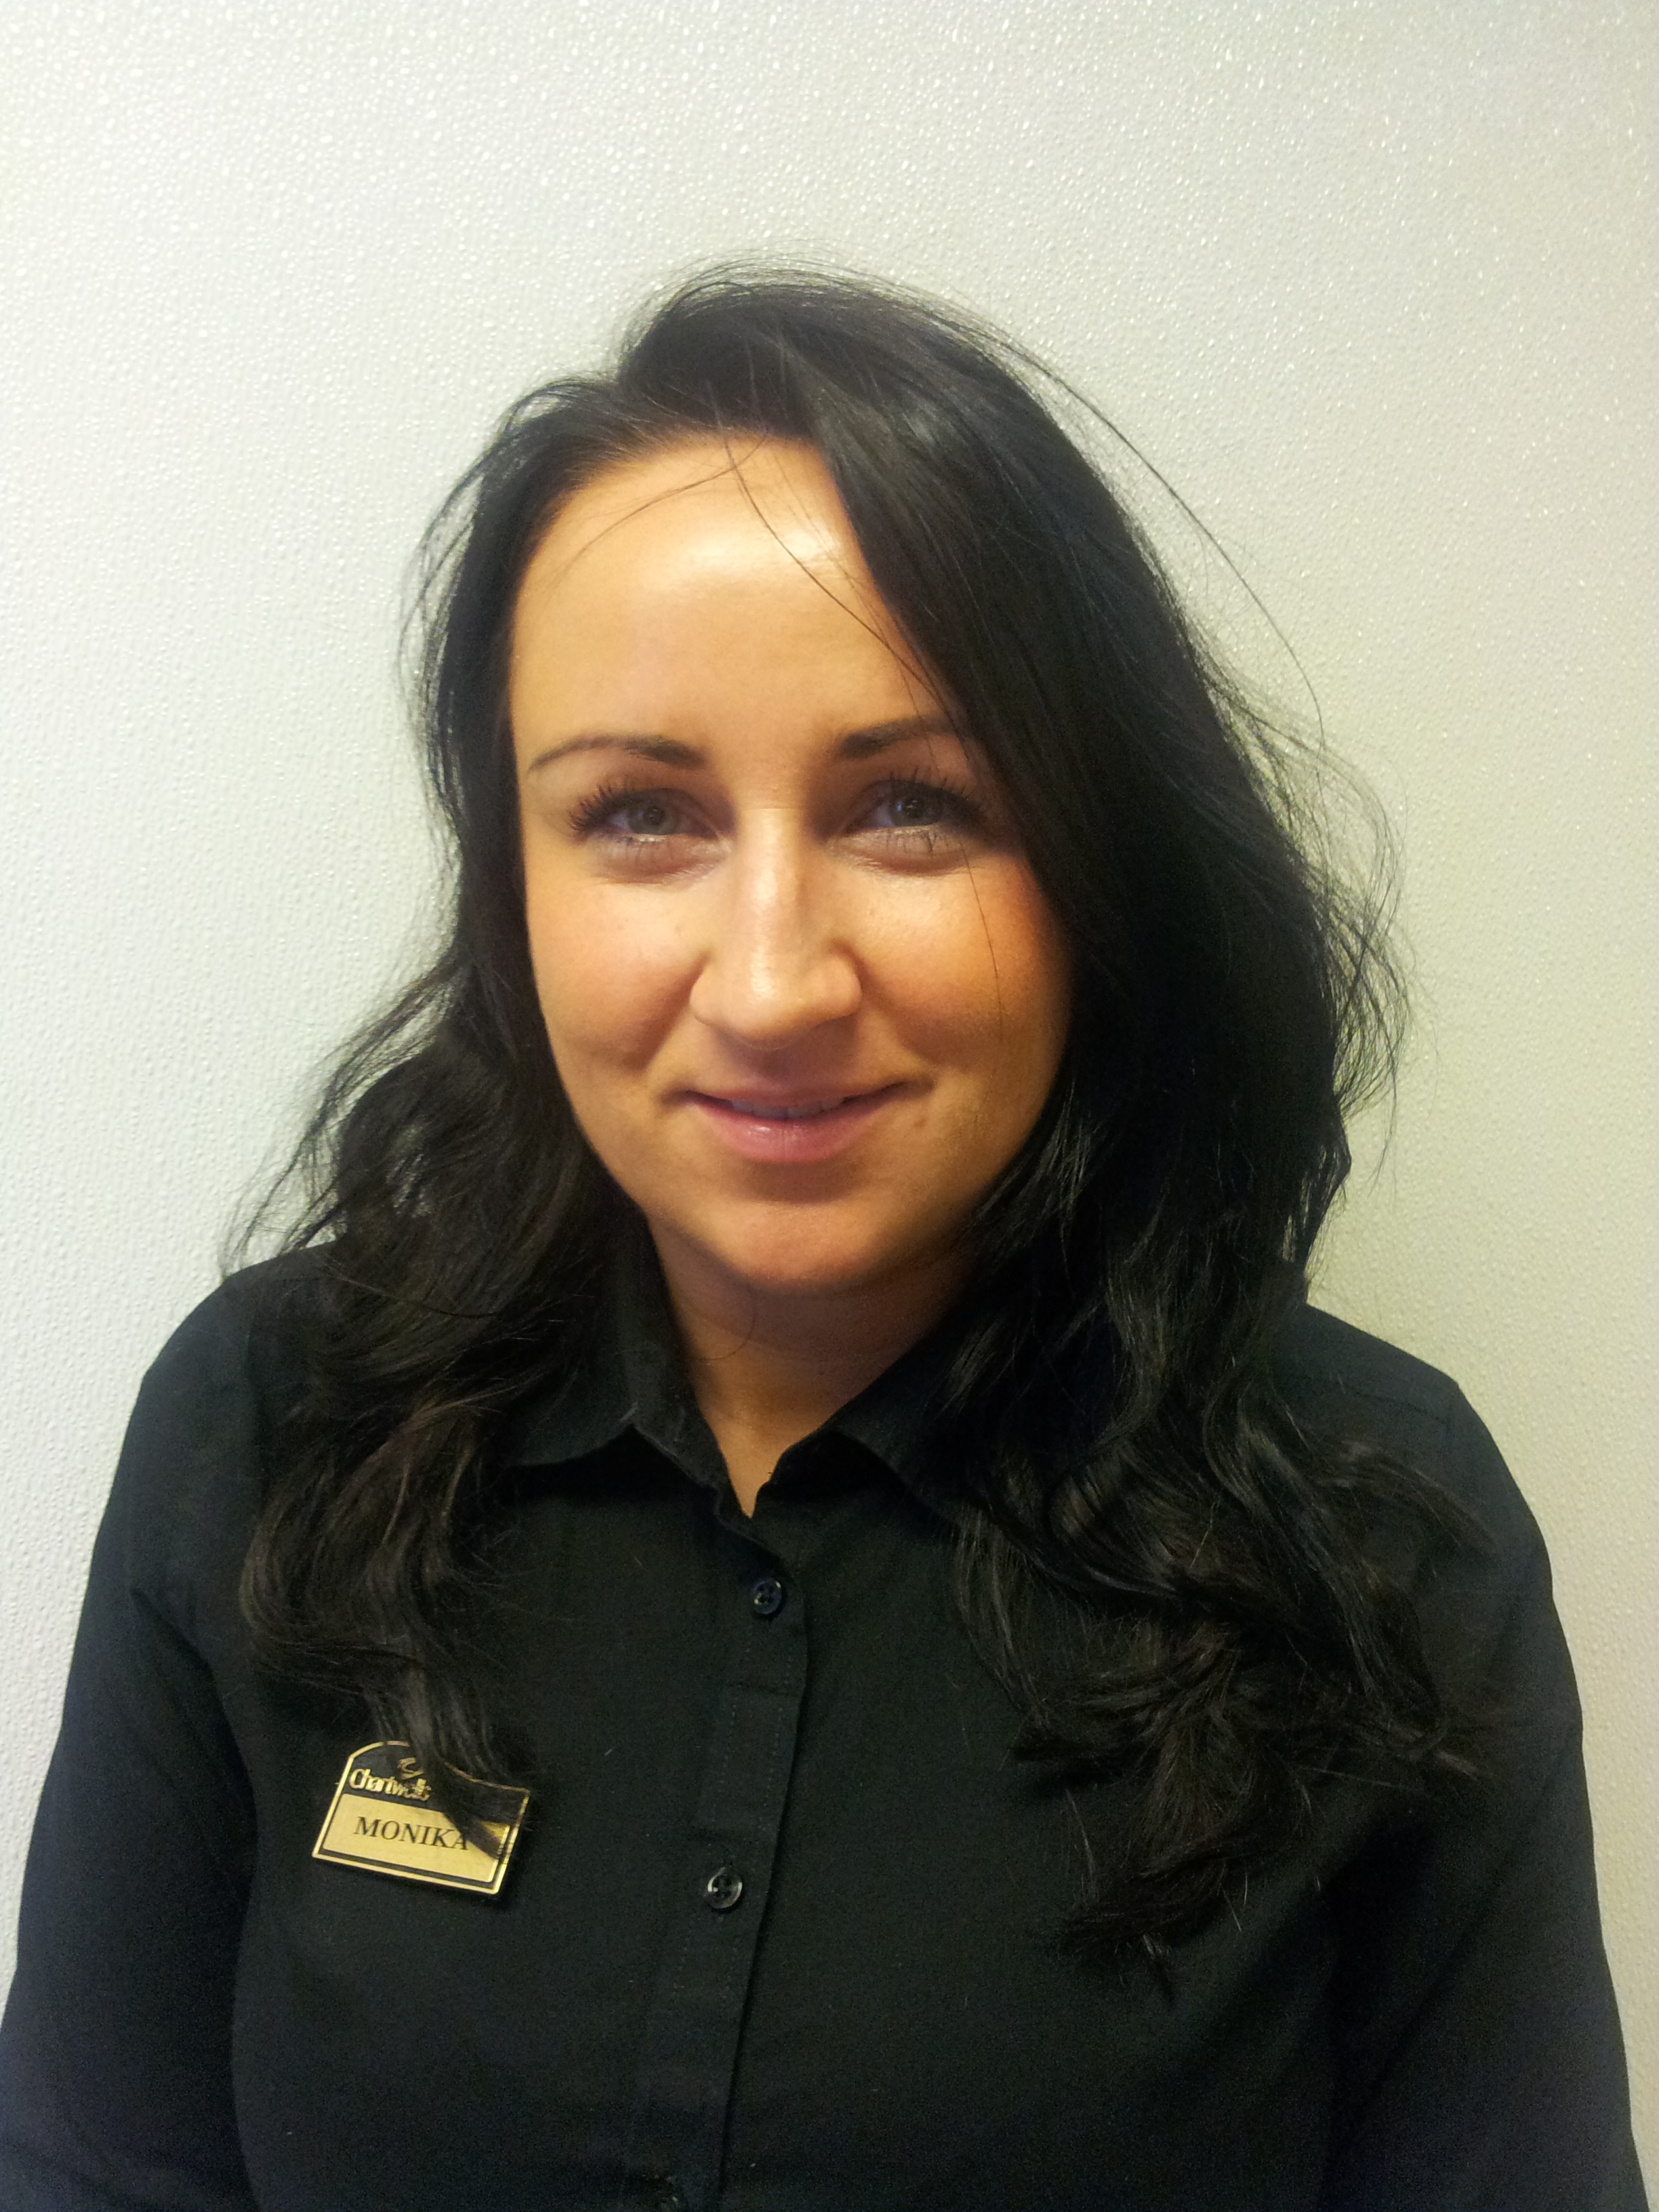 Monika Wojciechowski - Food Service Manager, North Residence